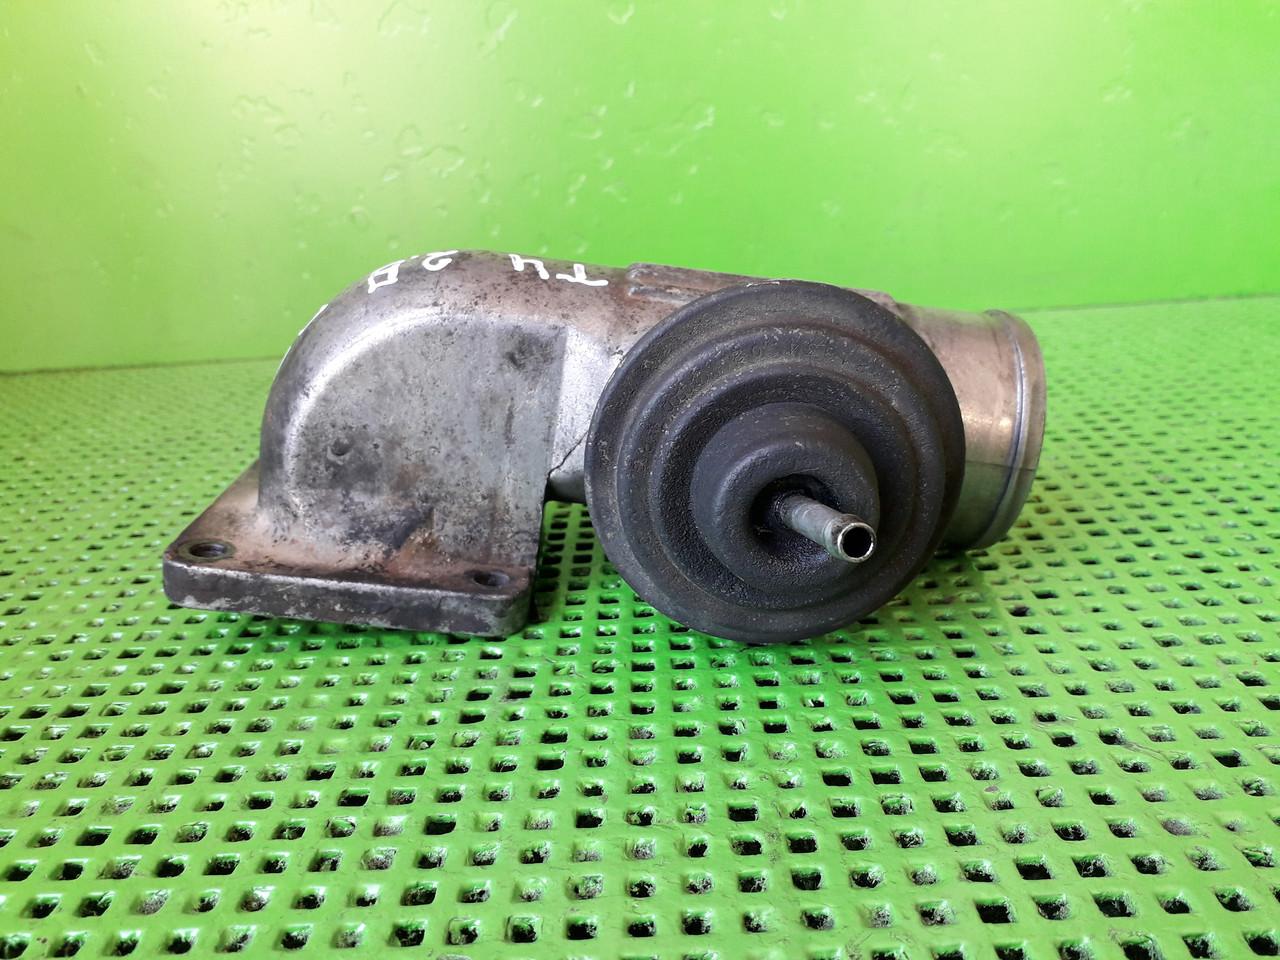 Клапан вентиляции картера EGR для Volkswagen T4 (Transporter) 2.5TD